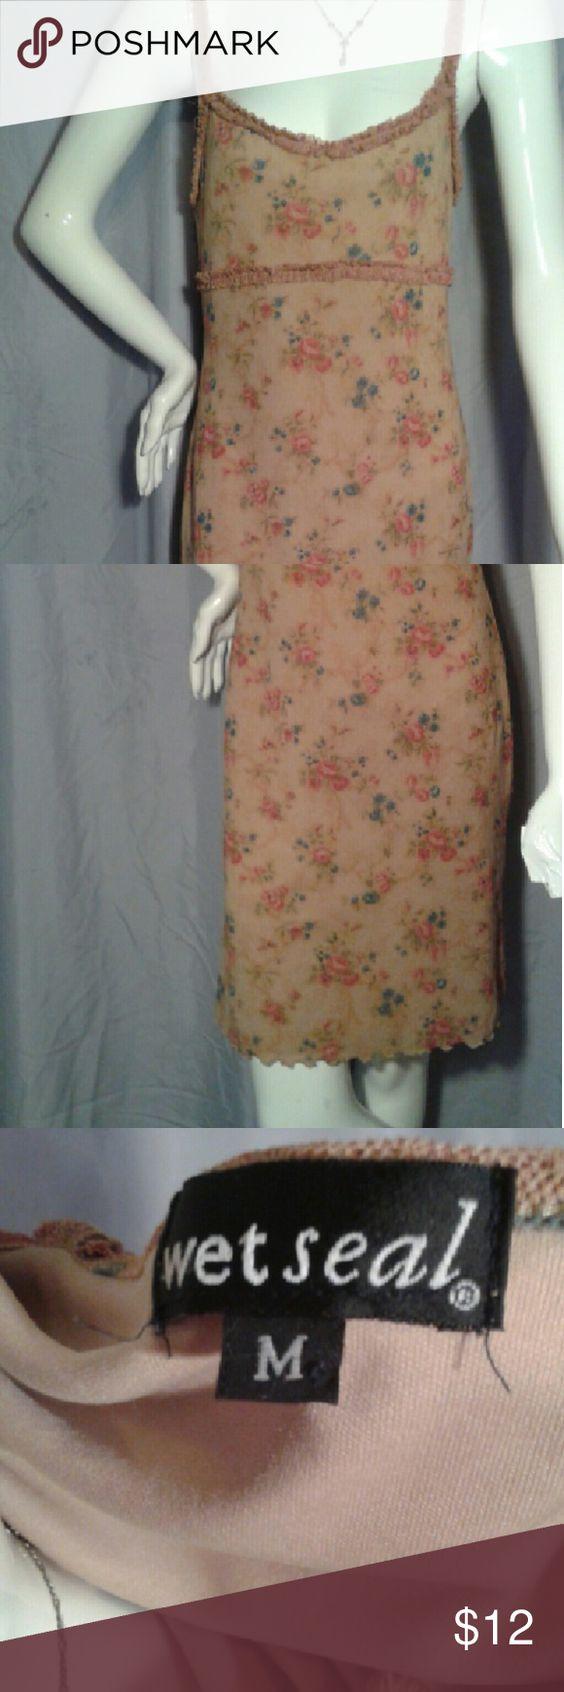 Wet Seal Dress Cute floral dress, feminine and comfortable Wet Seal Dresses